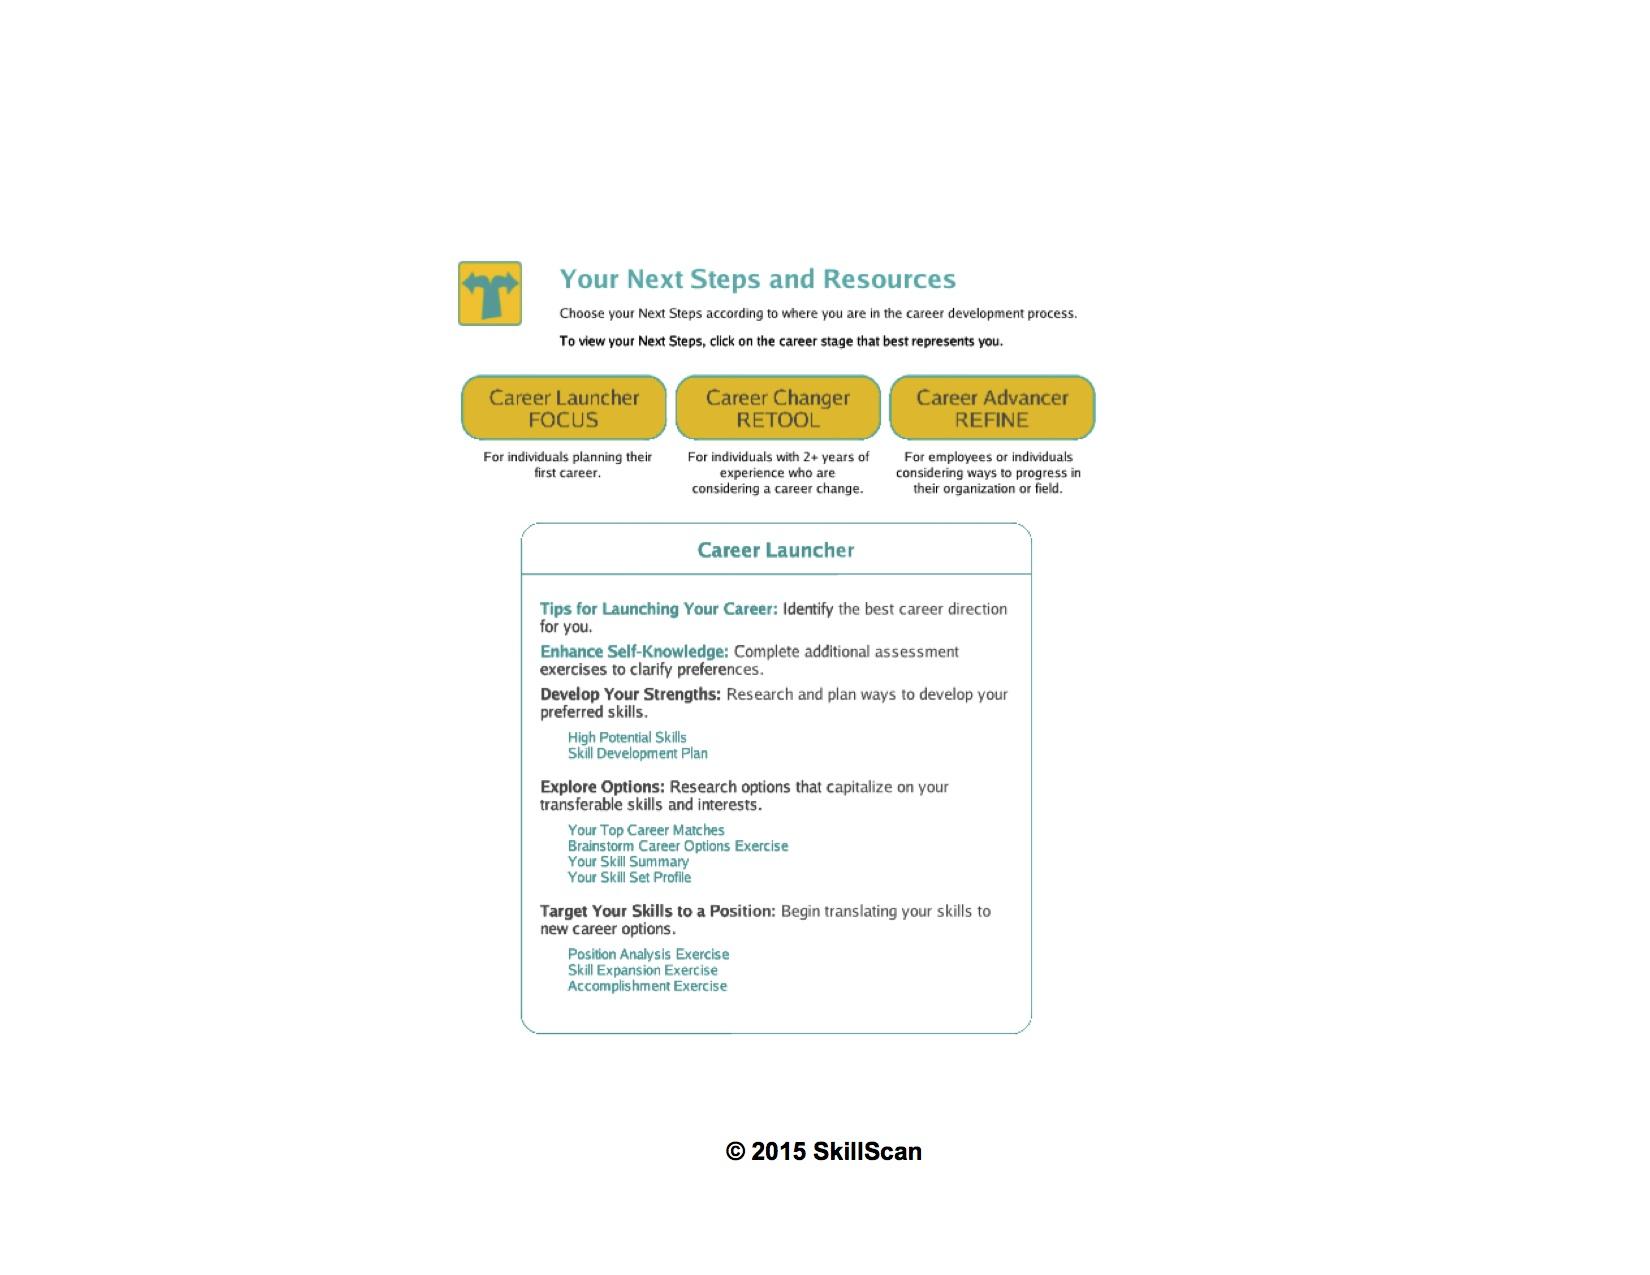 express or career driver online grantable uses skillscan see career driver screen samples